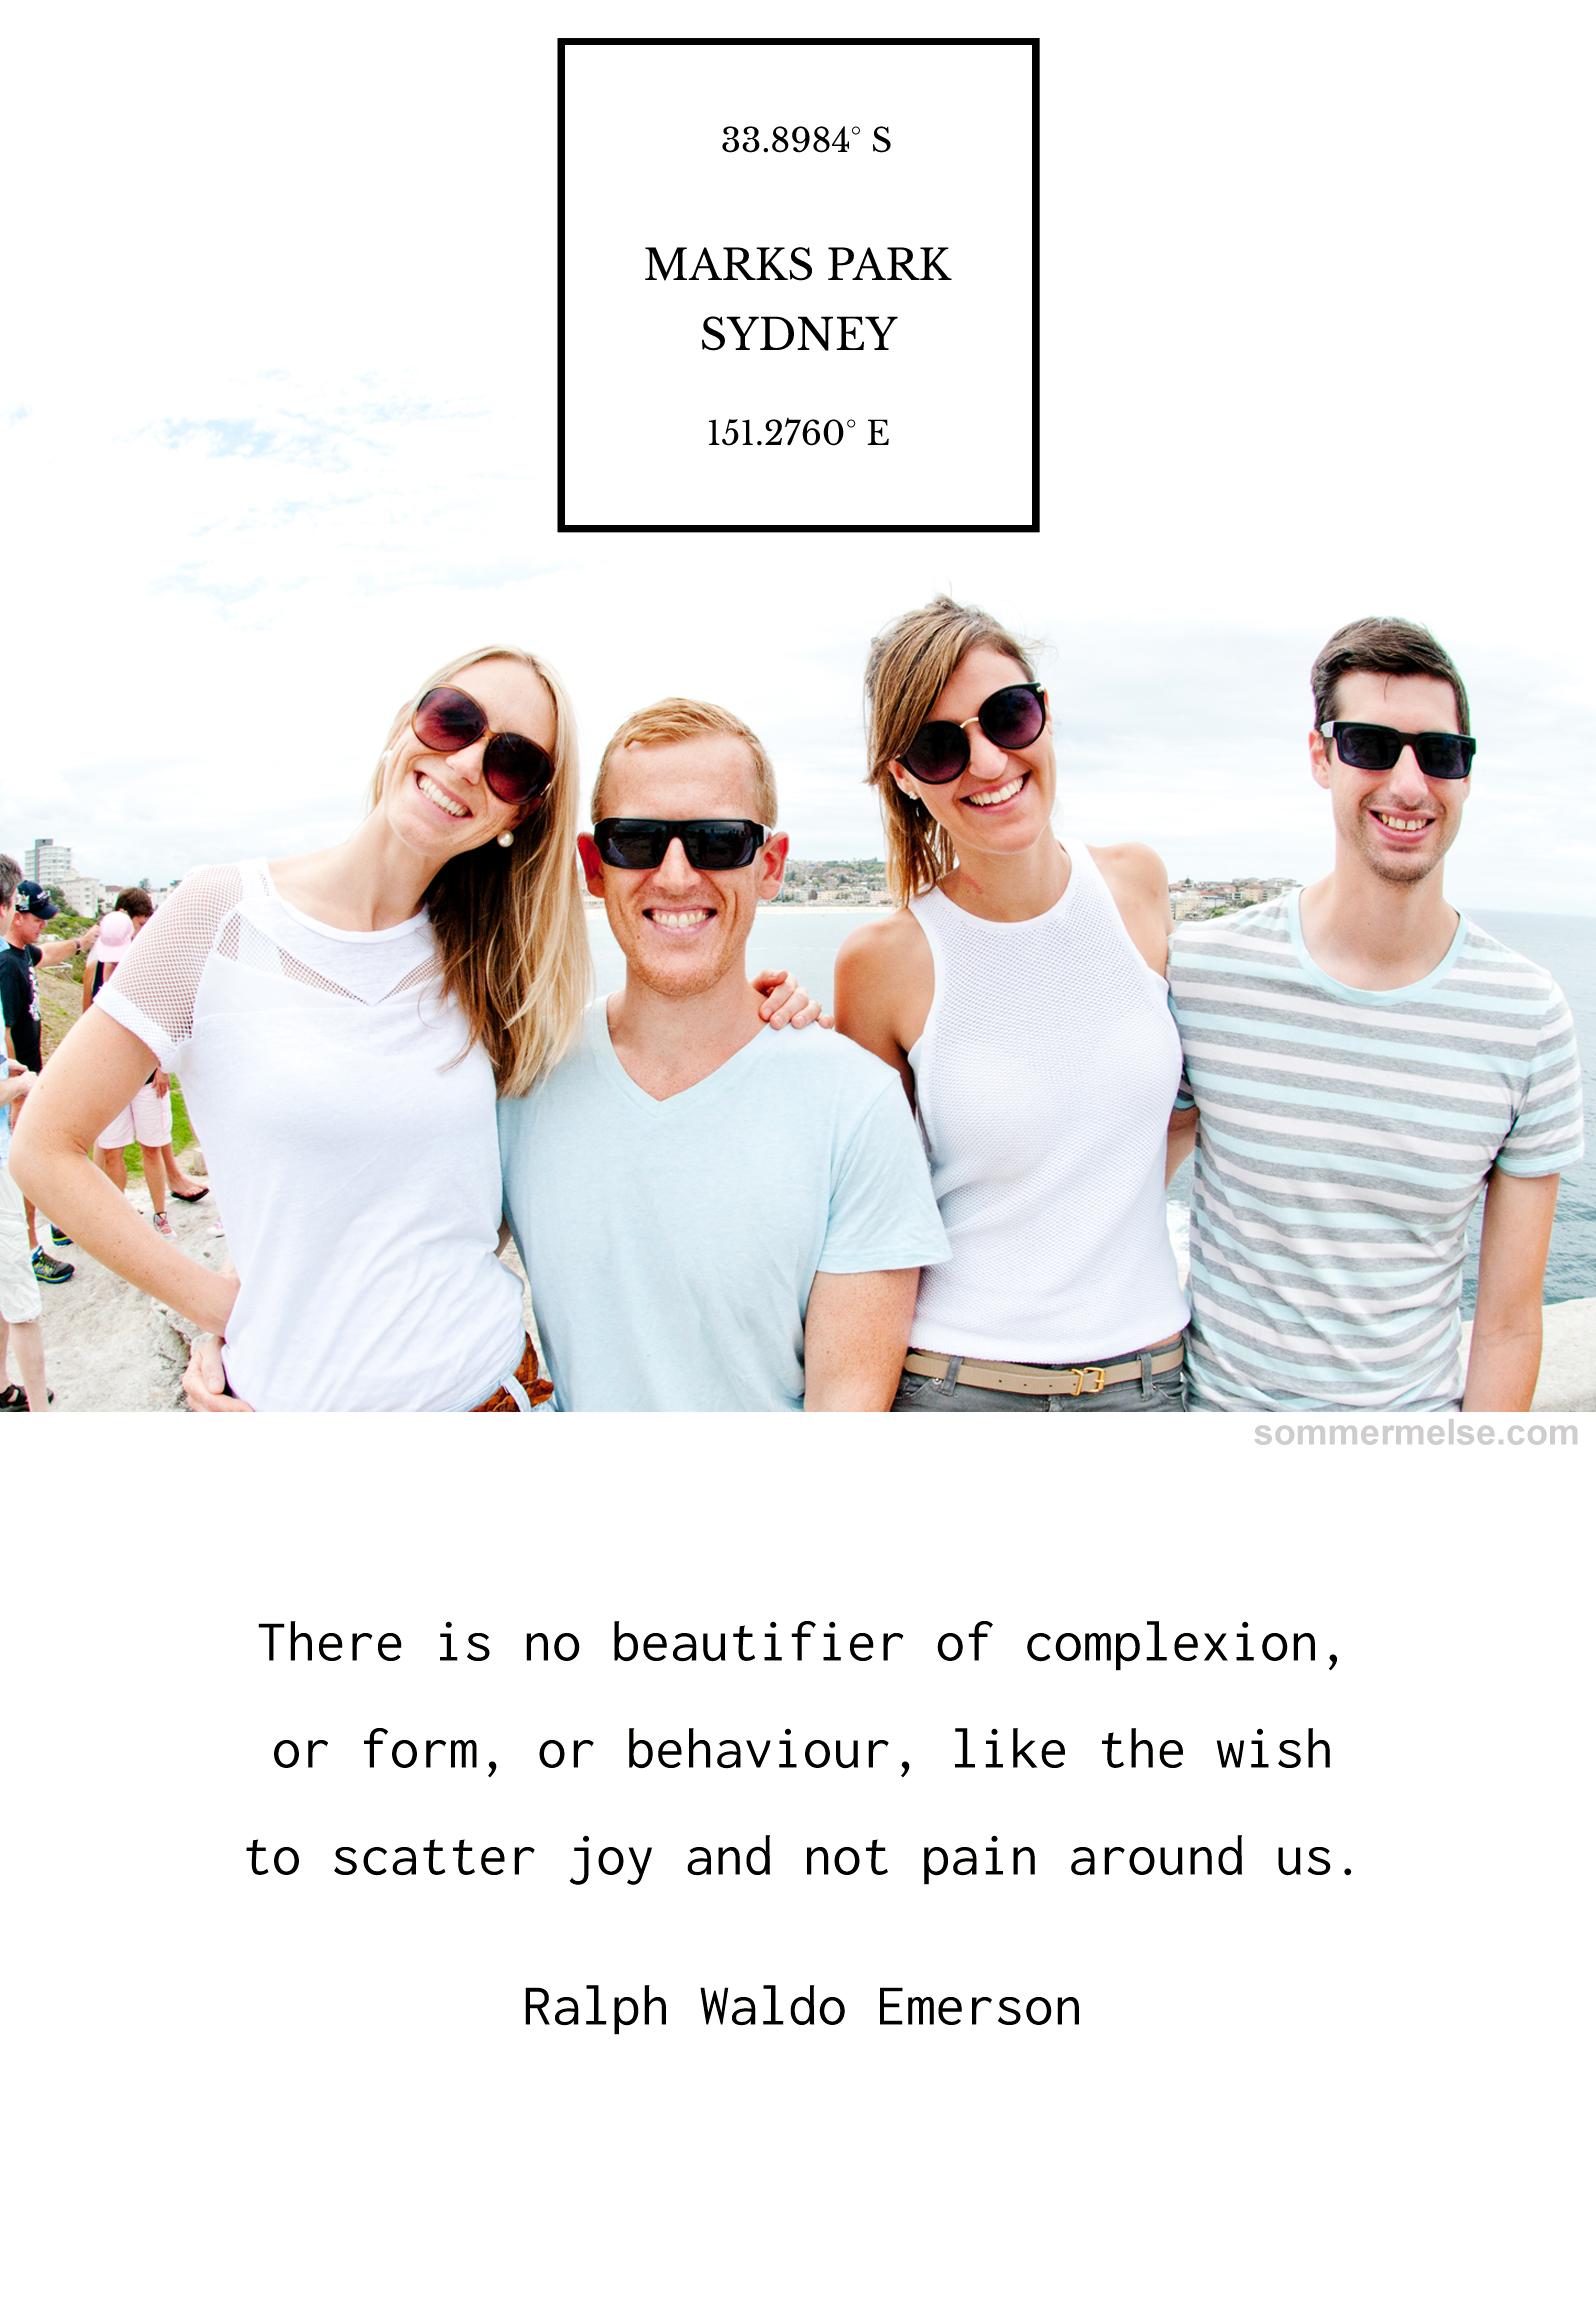 55_finding_wonder_scatter_joy_ralph_waldo_emerson